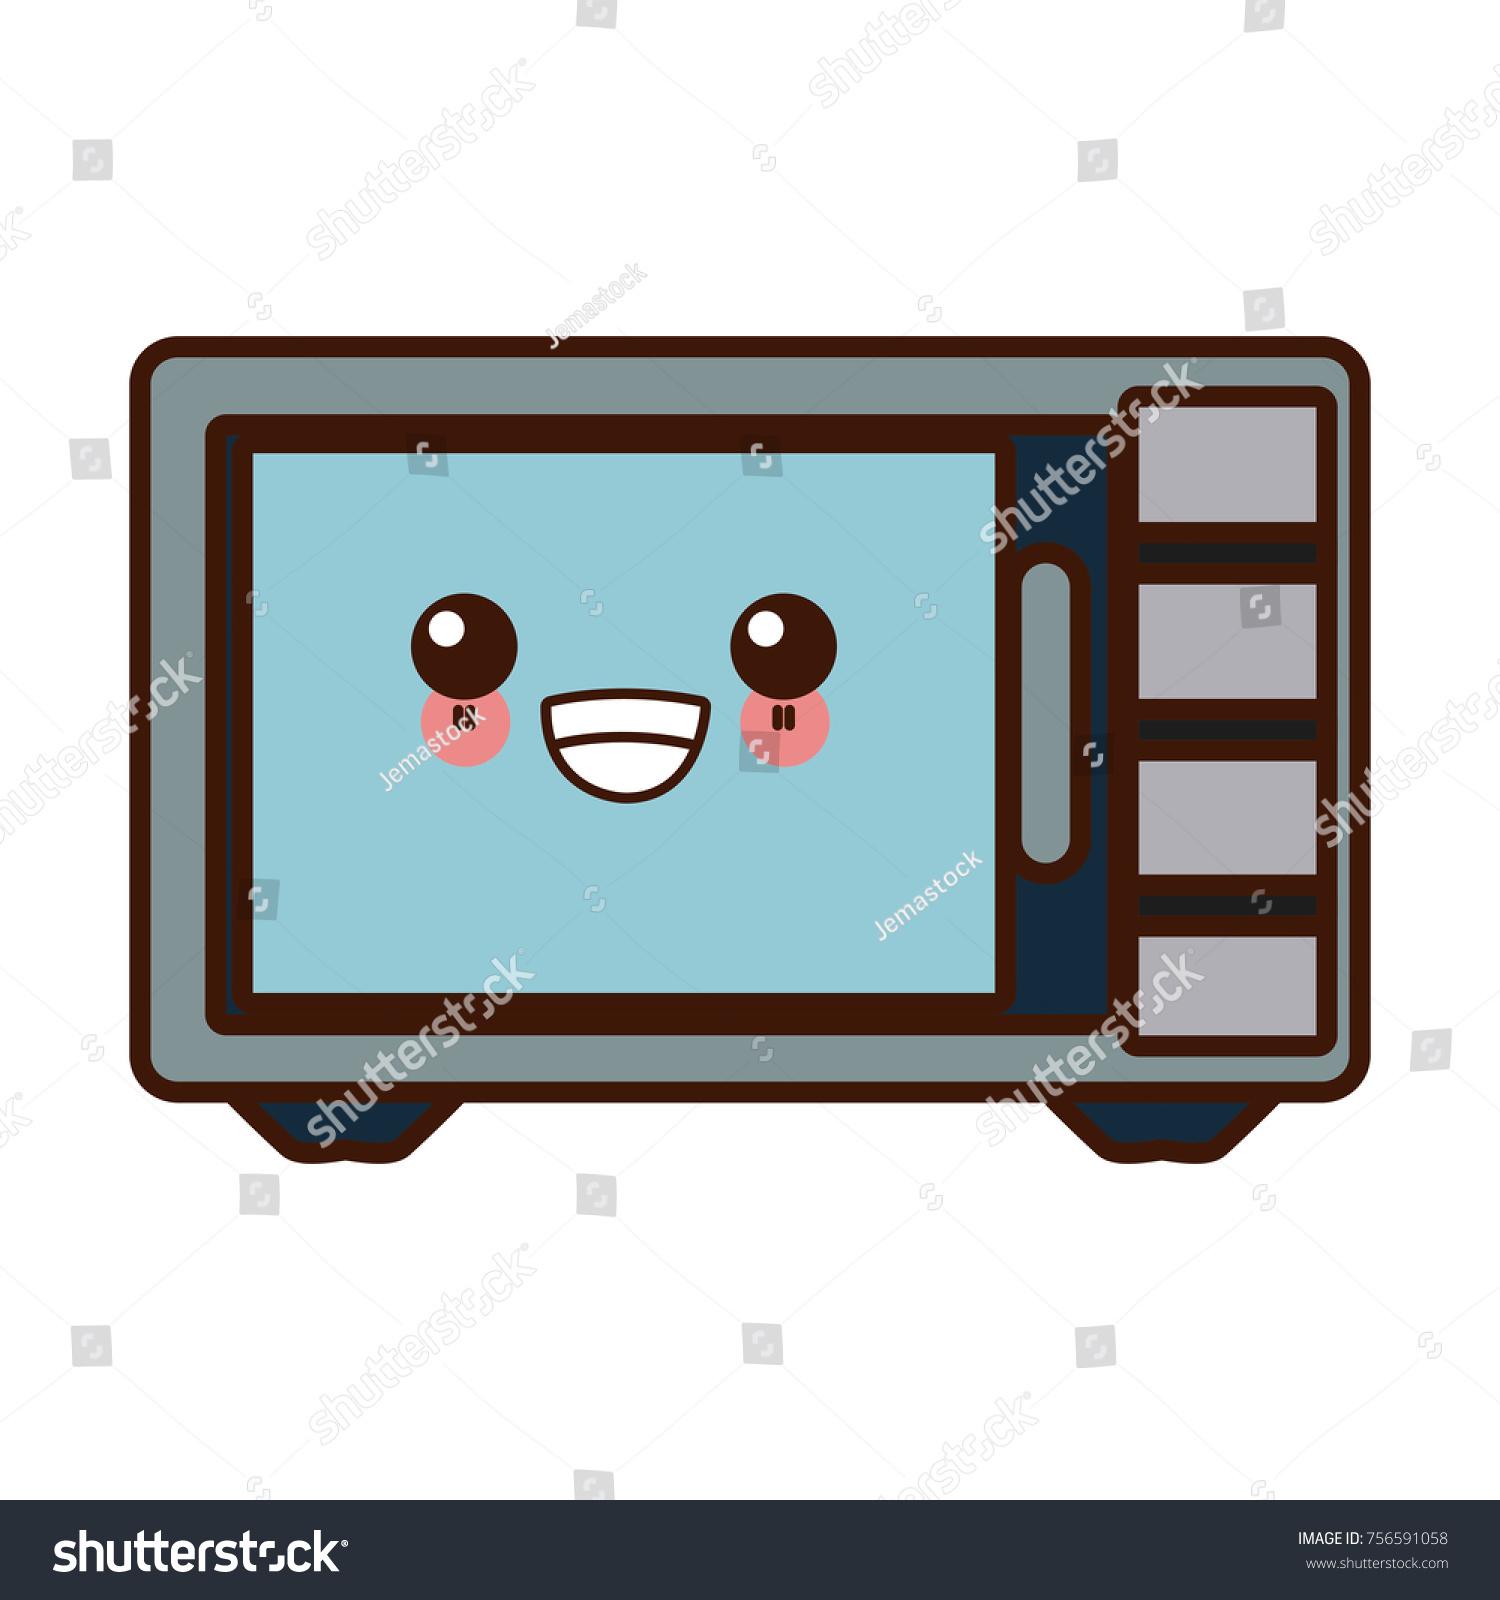 Microwave Kitchen Appliance Cute Kawaii Cartoon Stock Vector ...